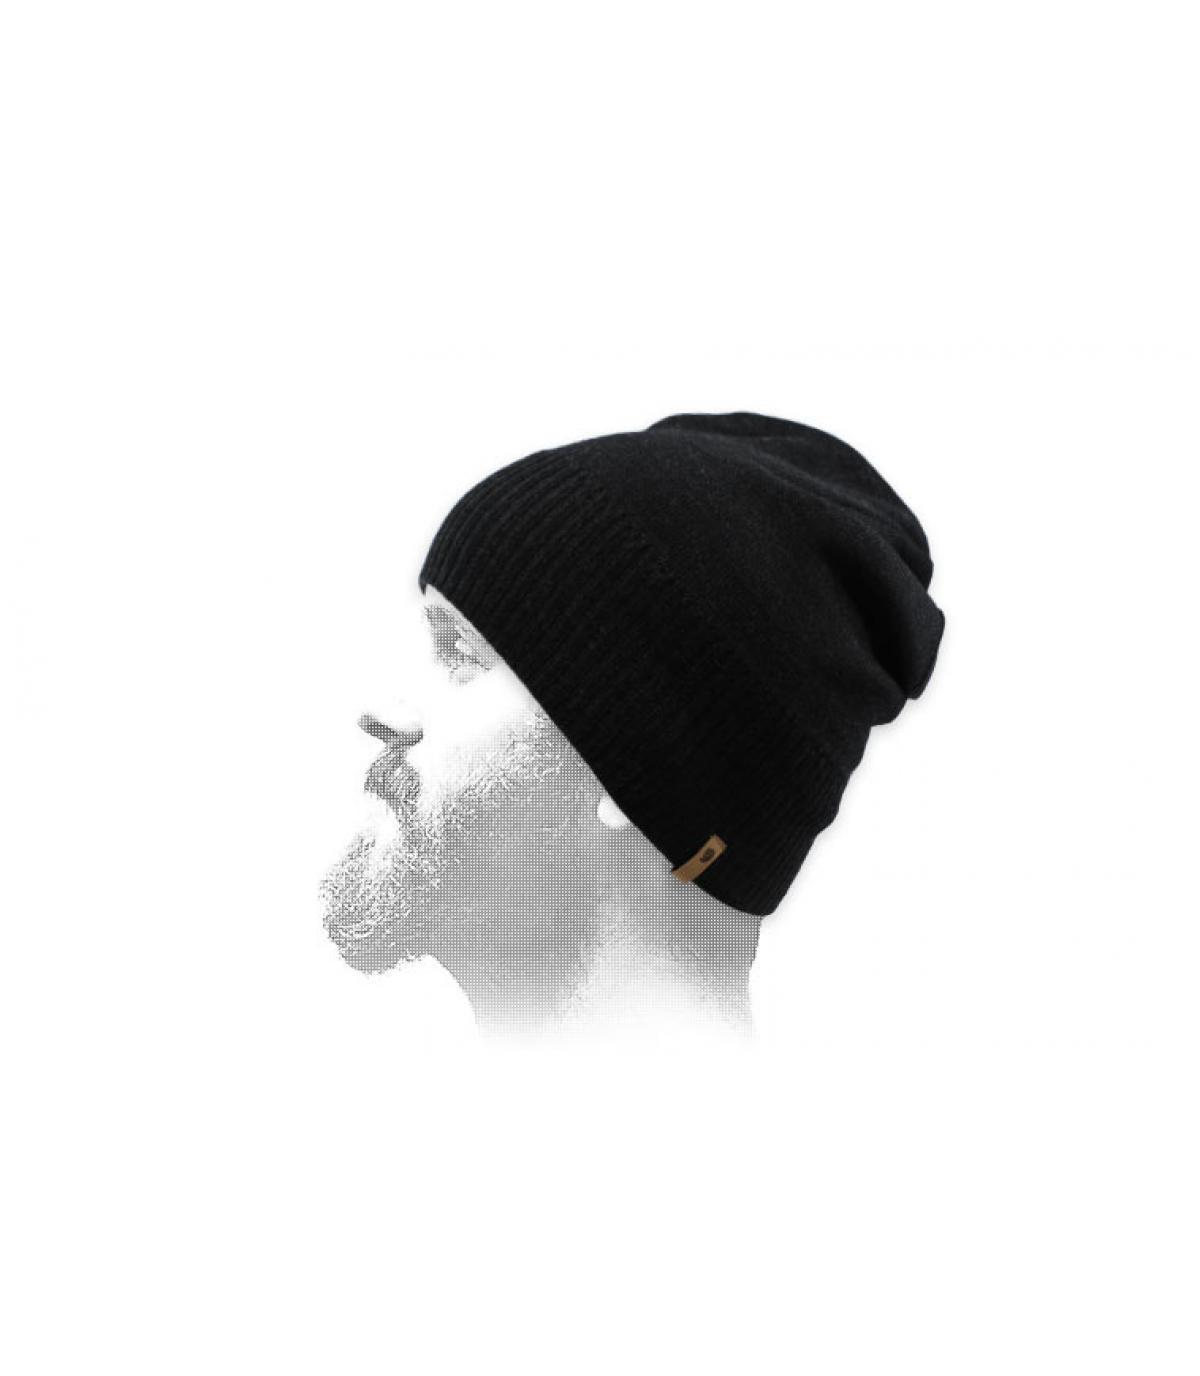 Kurze Mütze schwarz Wolle